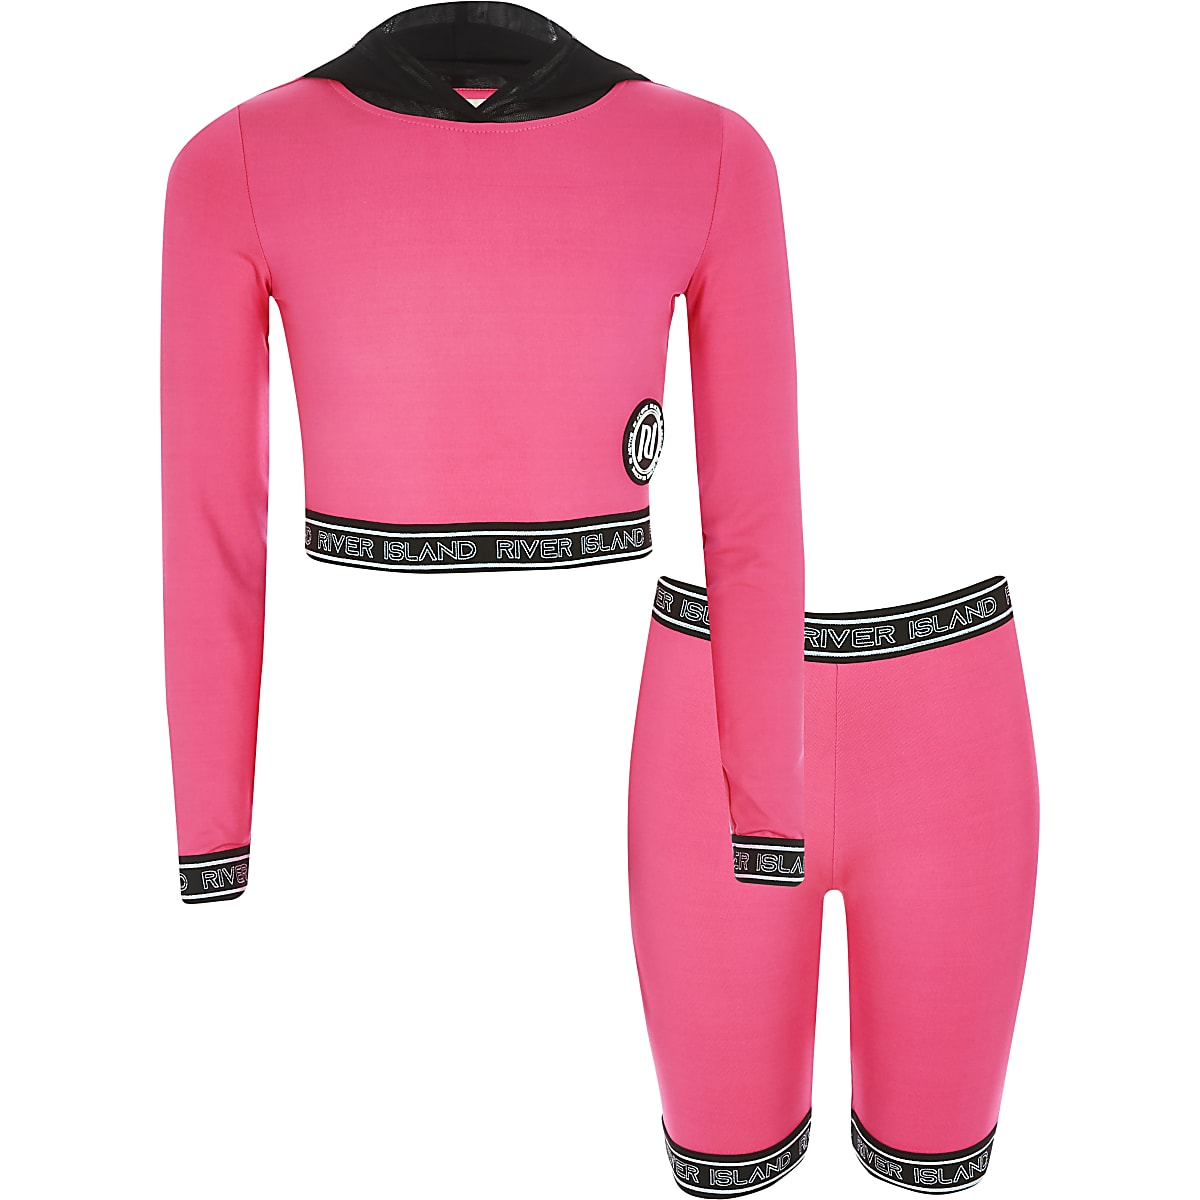 RI Active - Outfit met roze hoodie met RI-tekst voor meisjes